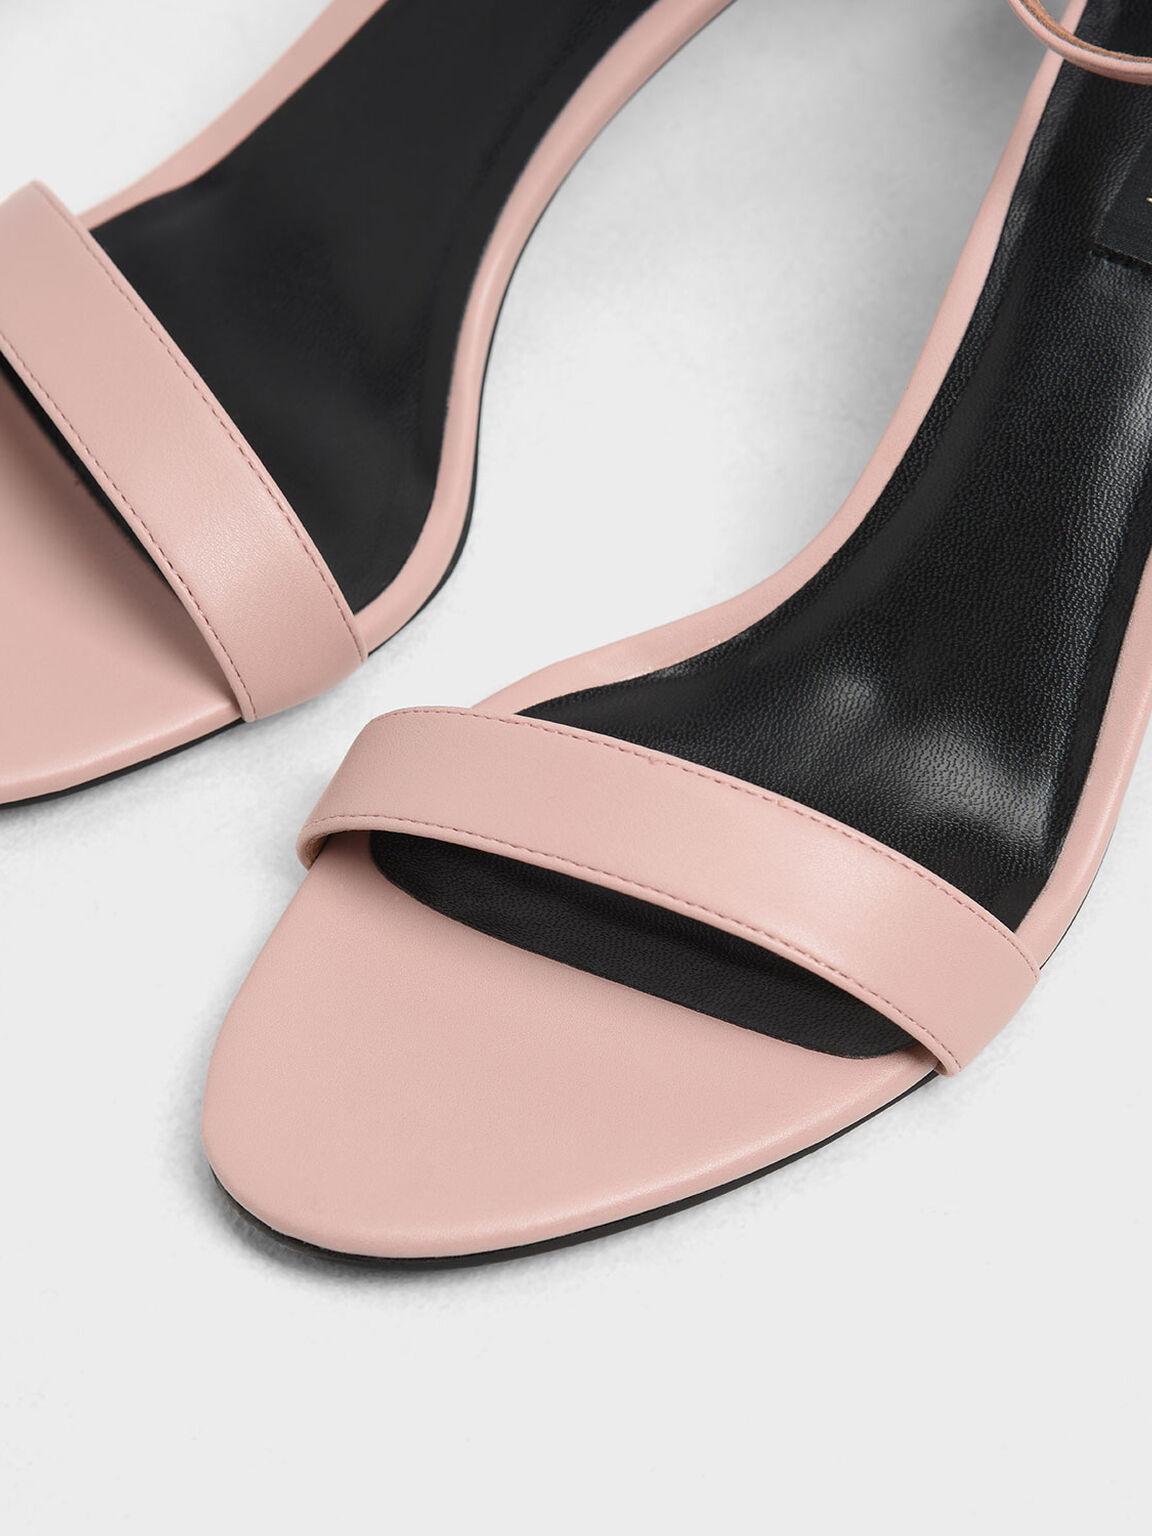 Classic Ankle Strap Heels, Blush, hi-res